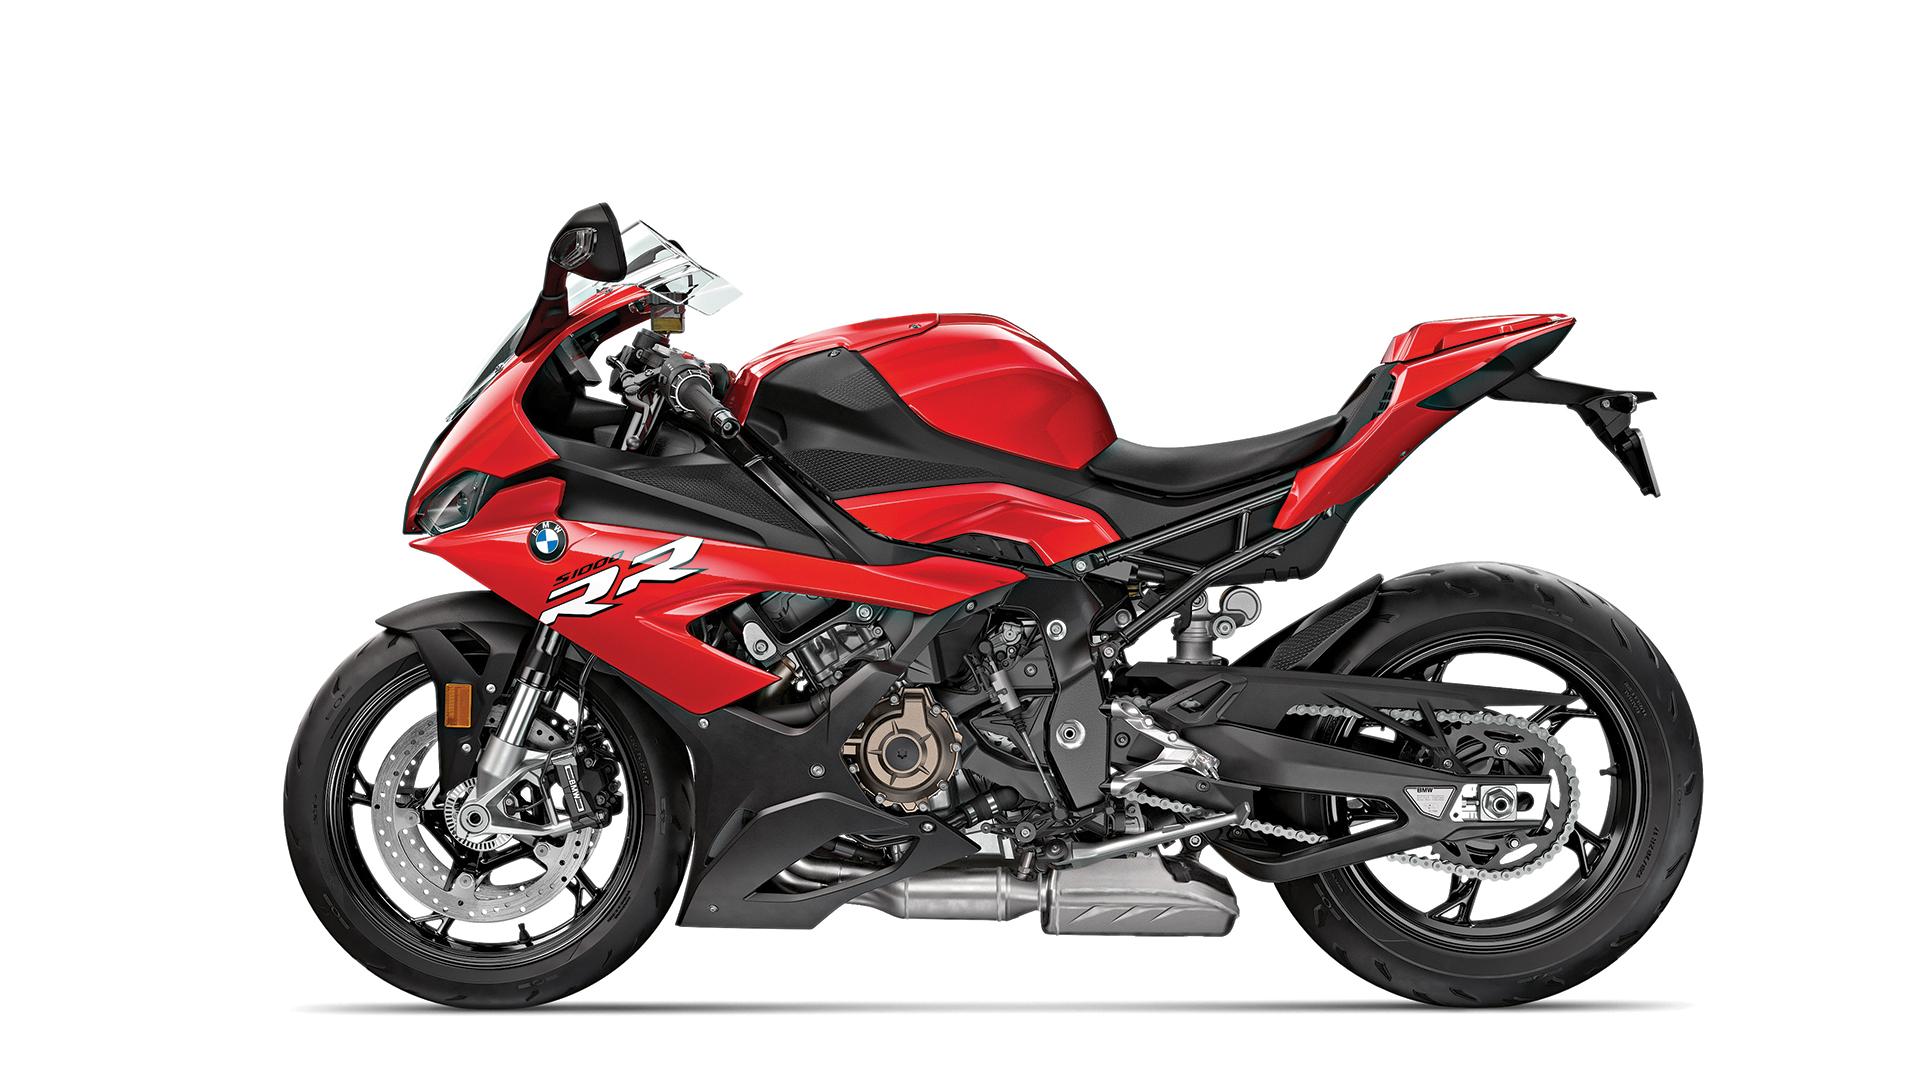 bmw-motorrad-2019-s-1000-rr